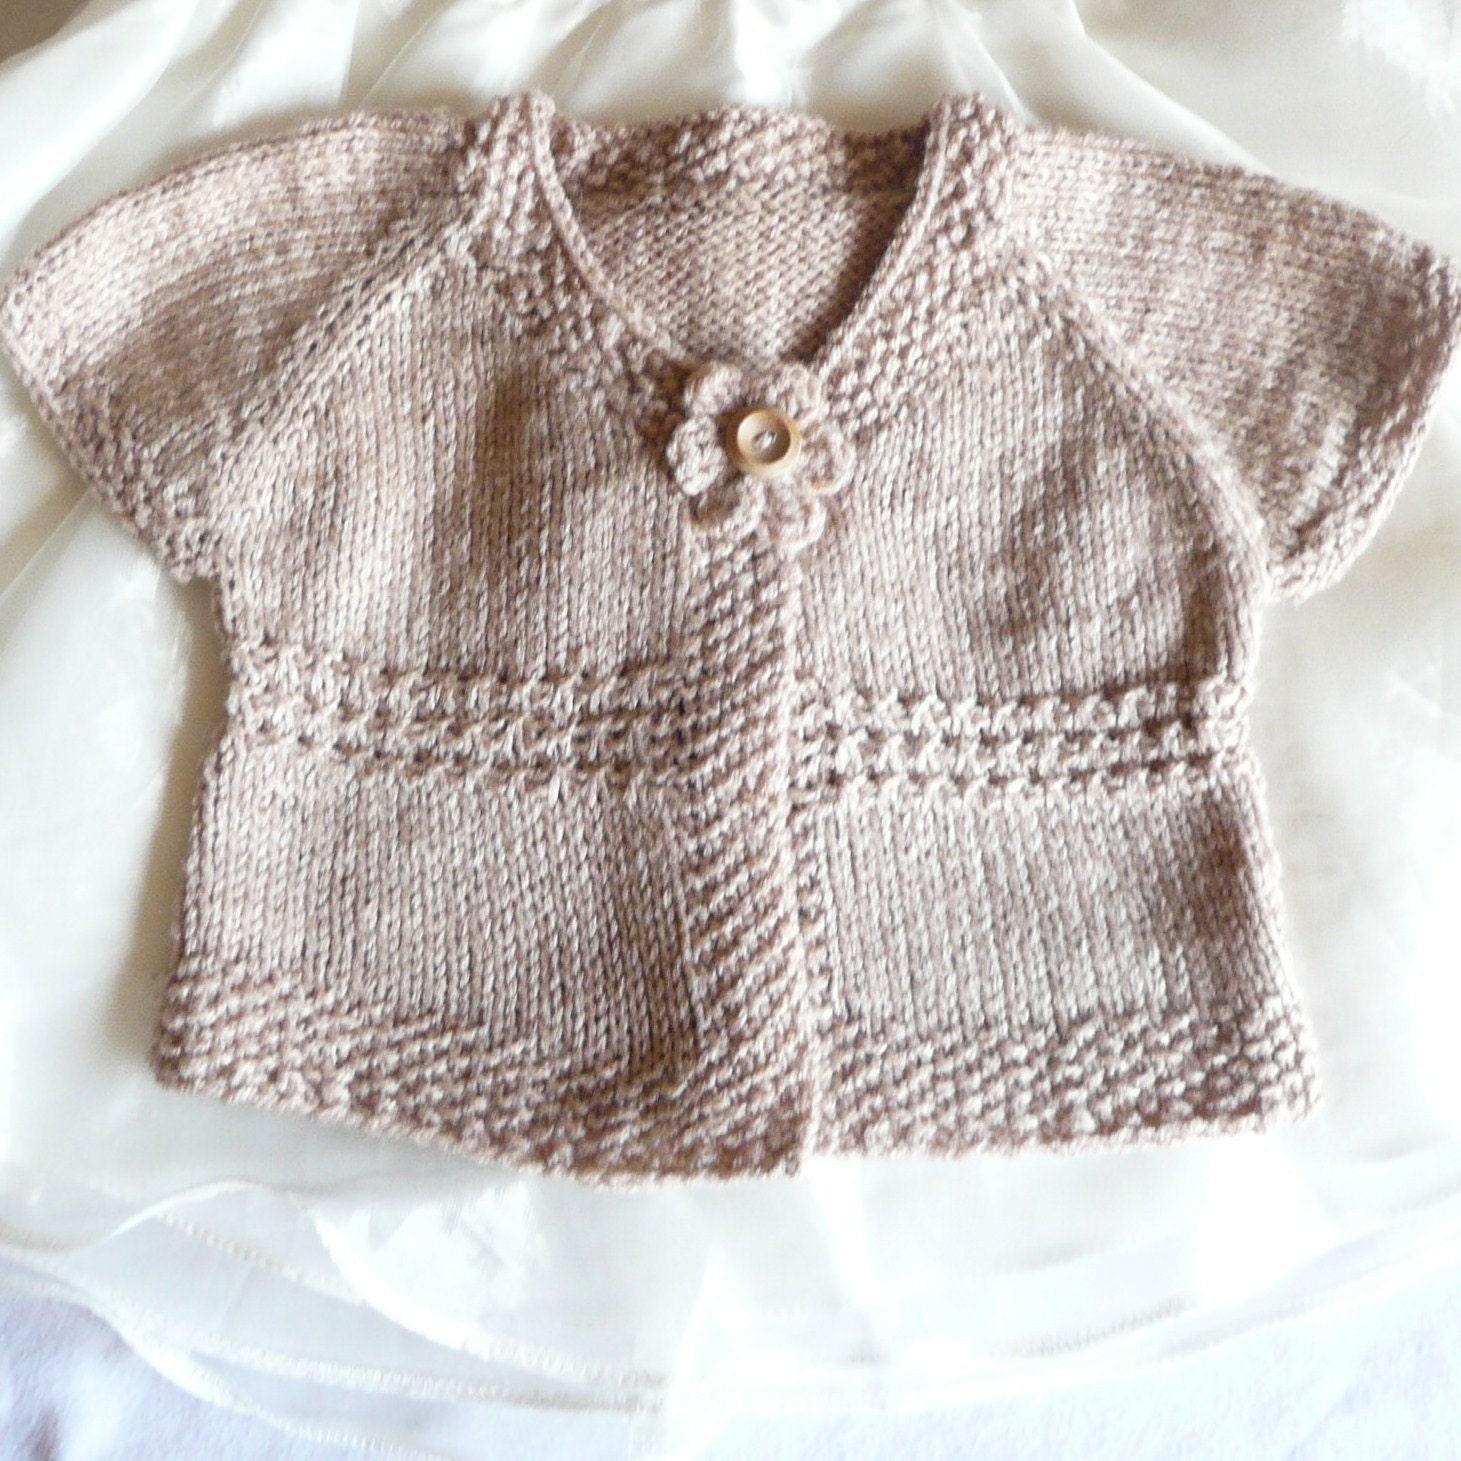 Top Down Toddler Sweater Knitting Pattern : Knitting Pattern Cardigan Sweater Emma a Seamless Top Down